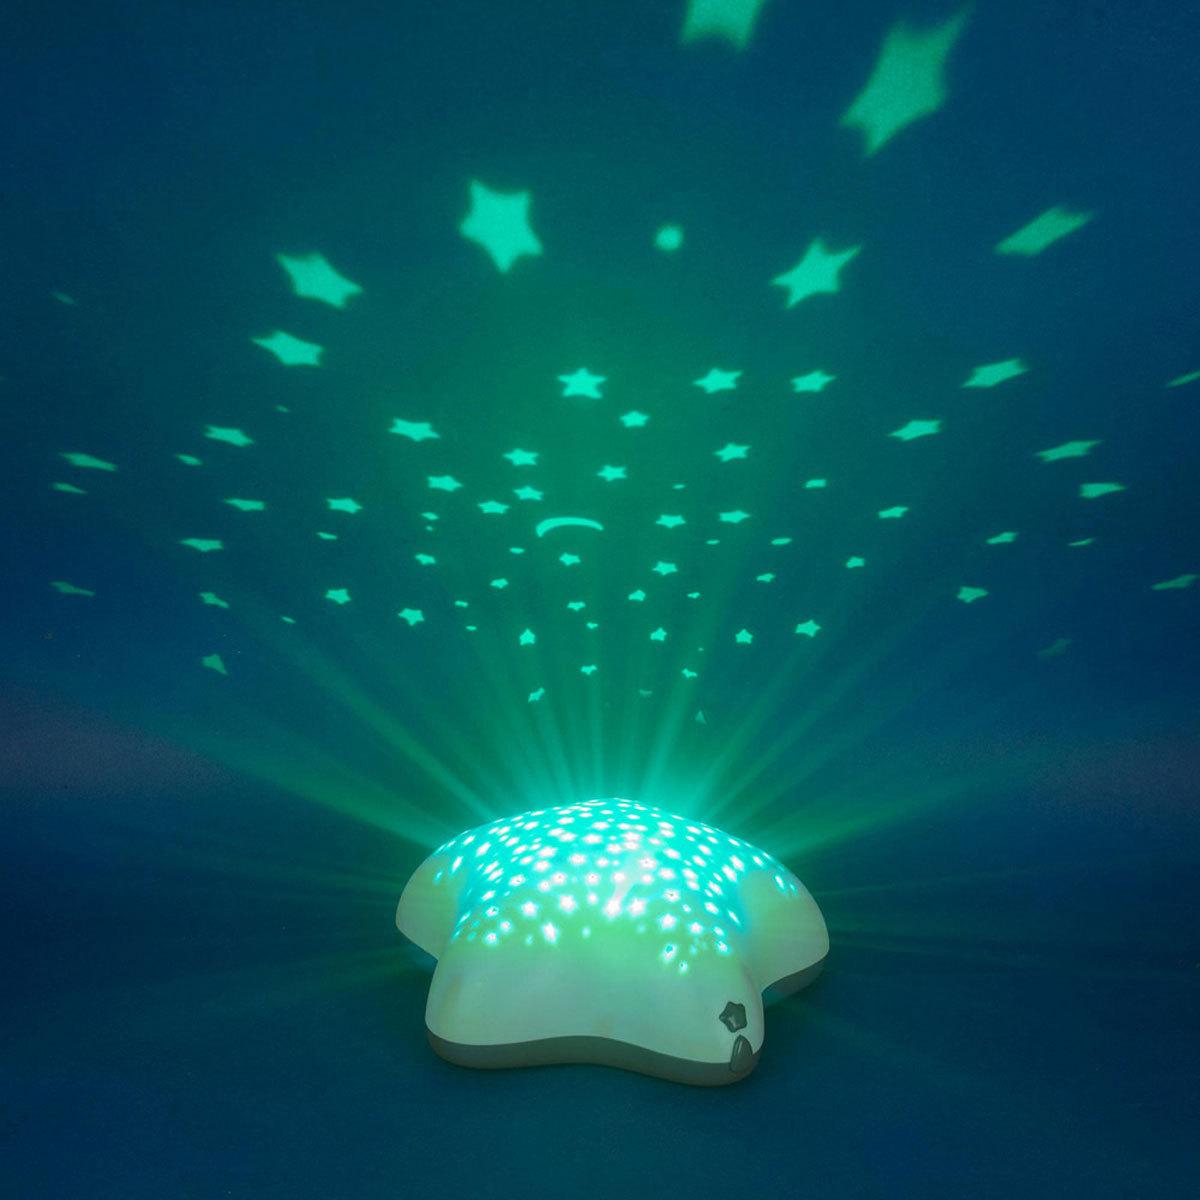 Pabobo veilleuse projecteur d 39 etoiles timoleo veilleuse pabobo sur l 39 armoire de b b - Veilleuse projecteur etoile ...